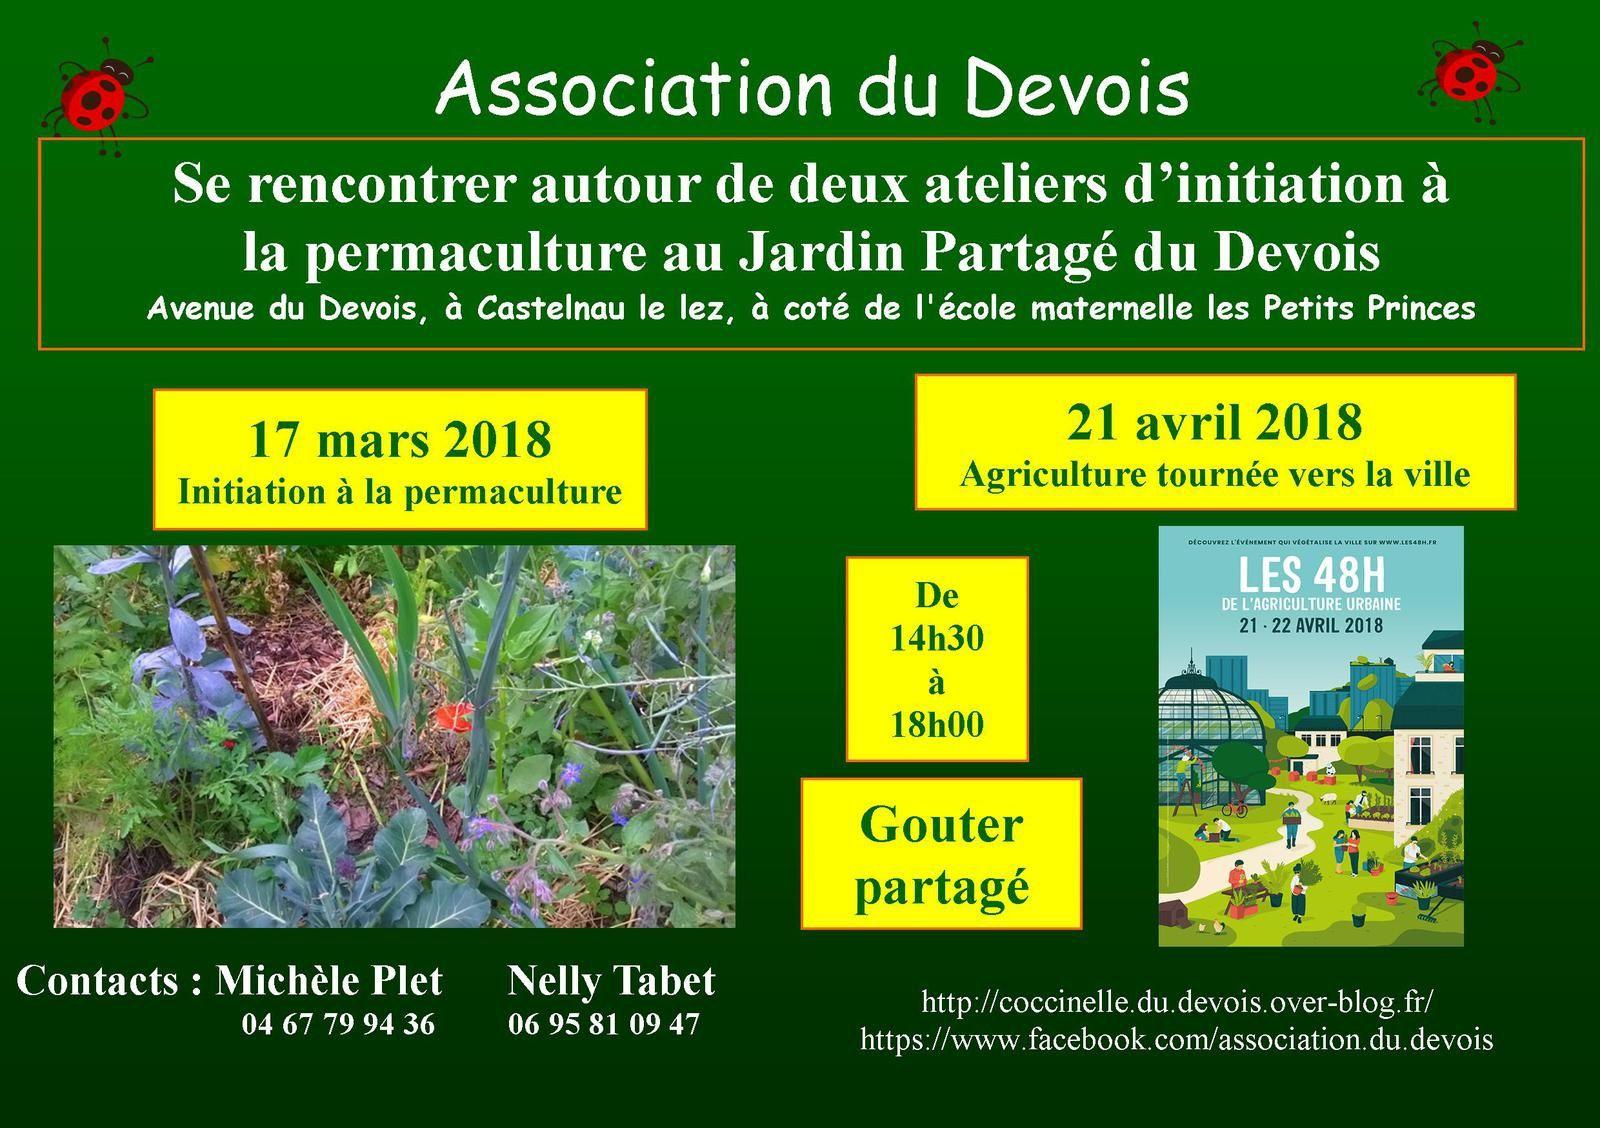 Samedi 21 avril : les 48H de l'agriculture urbaine